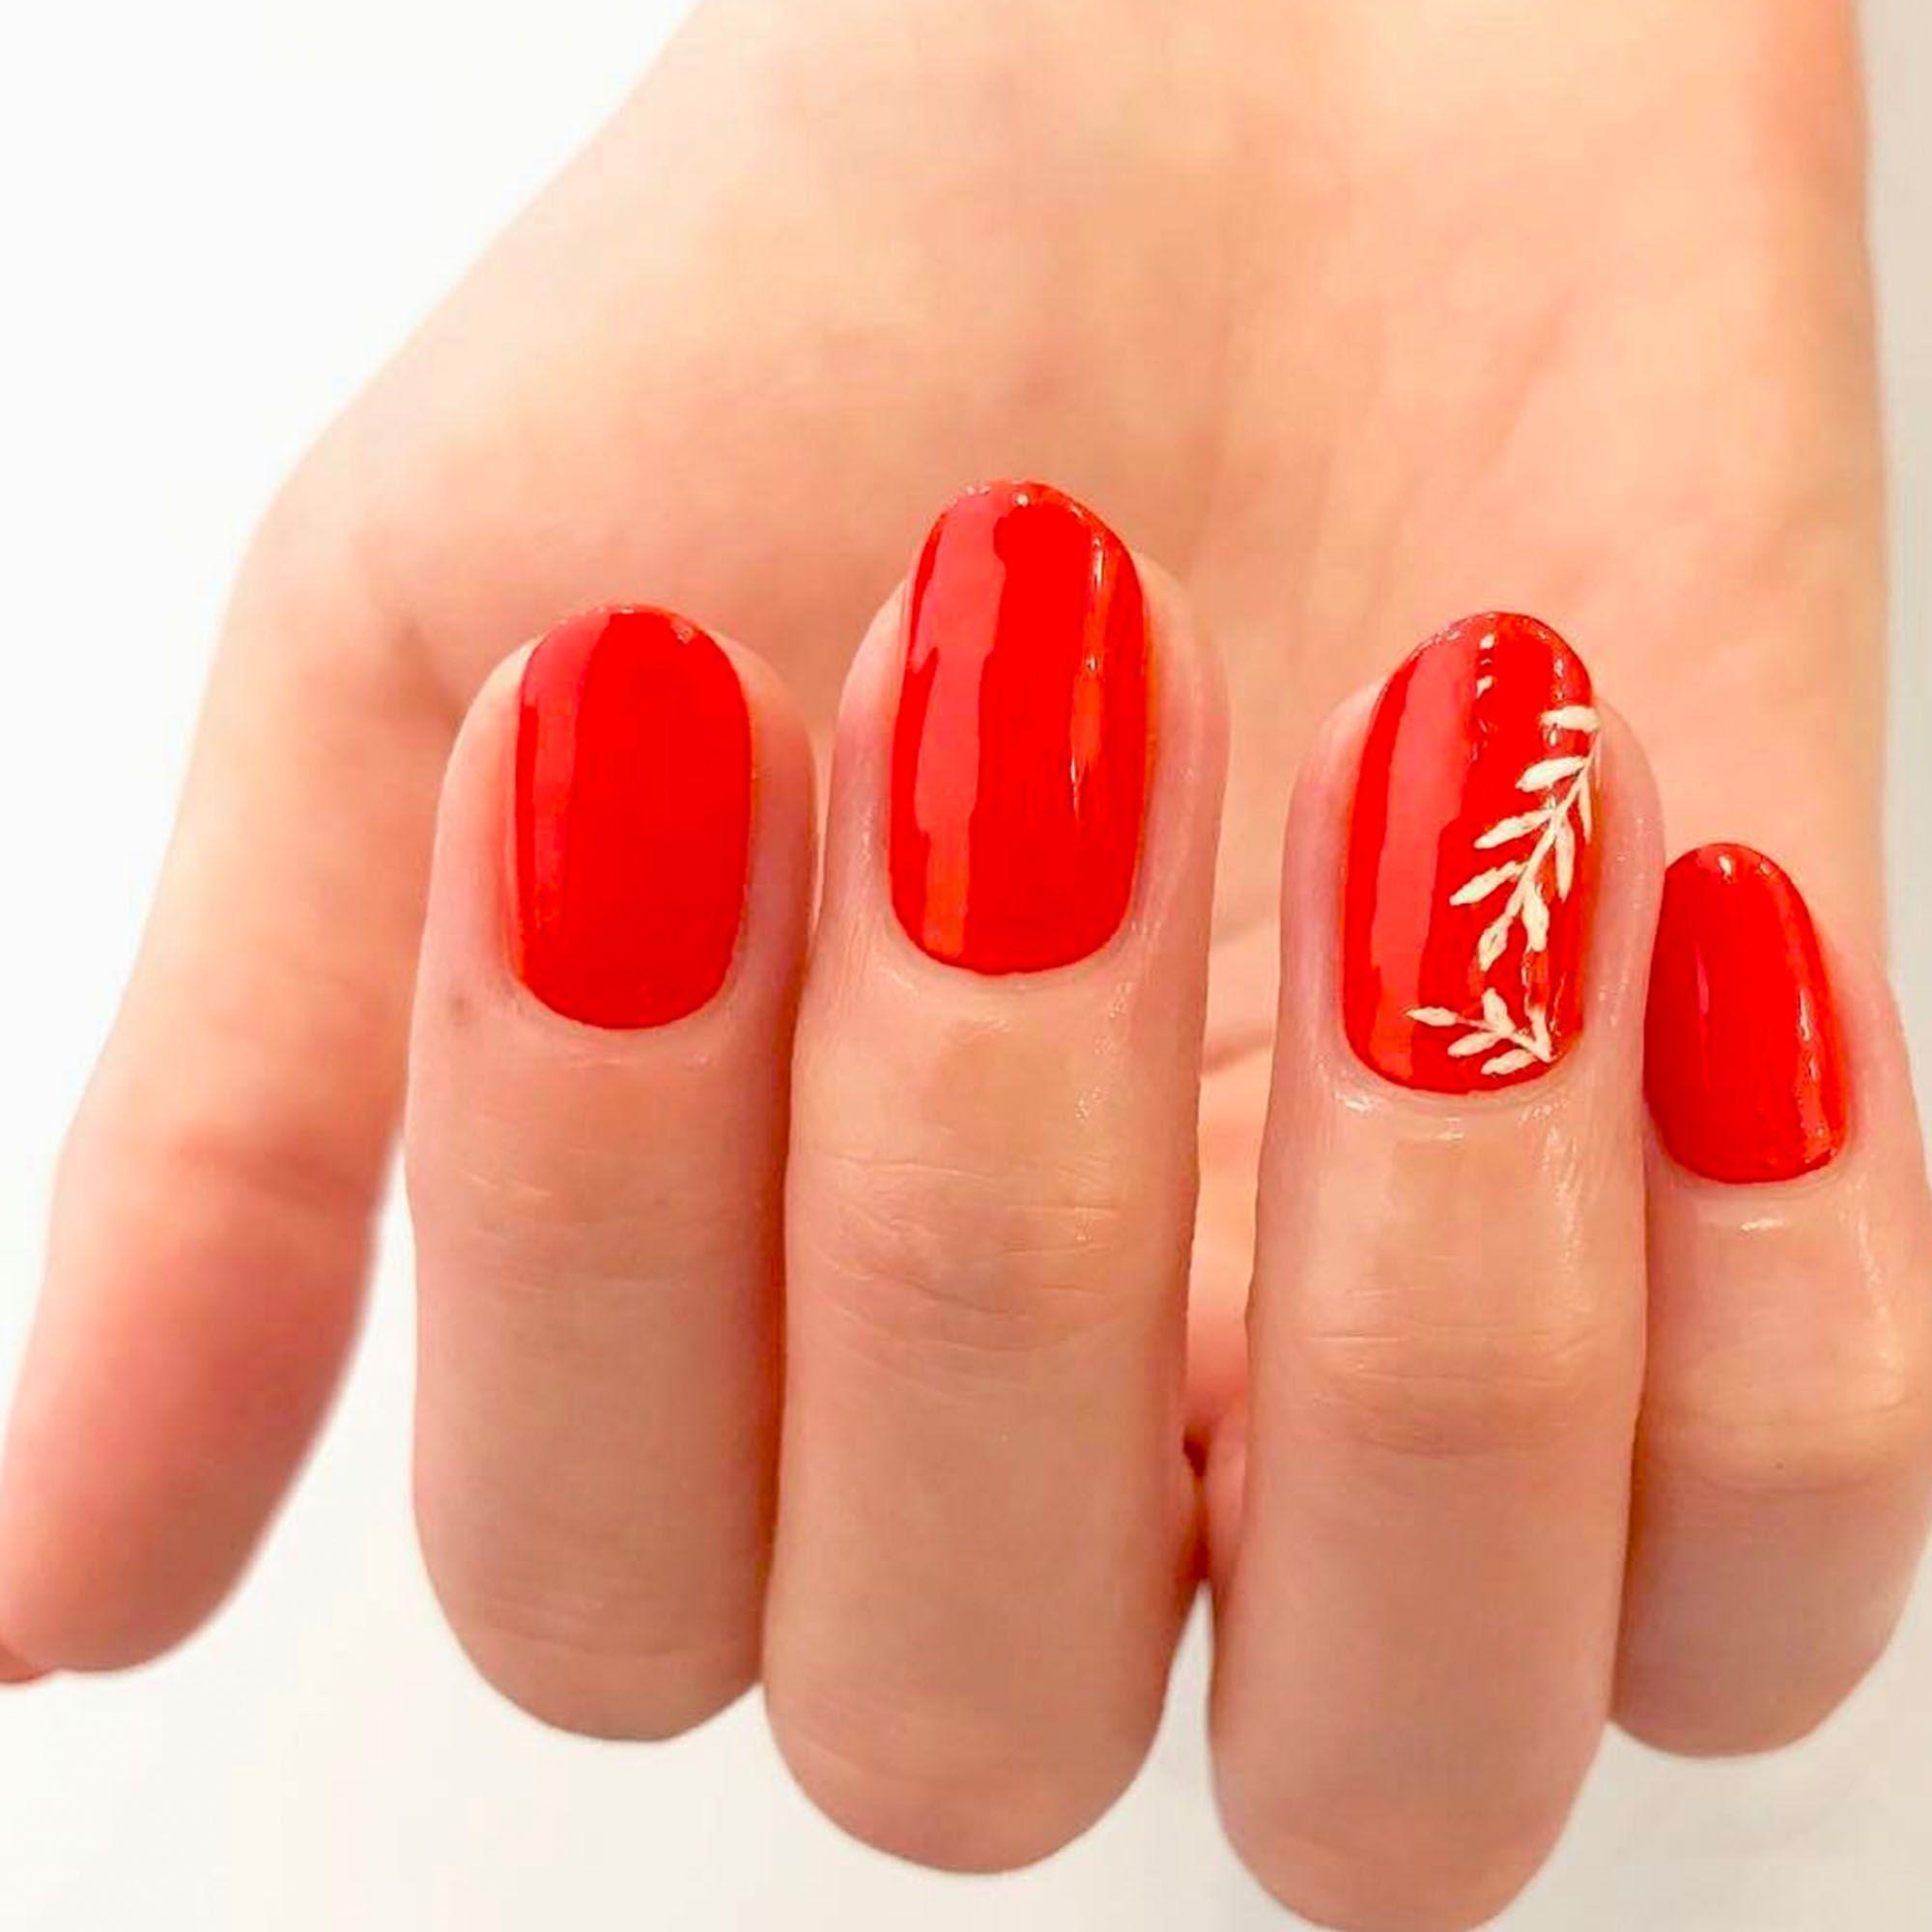 Red Nail Art: Cute Nail Art Ideas For A Red